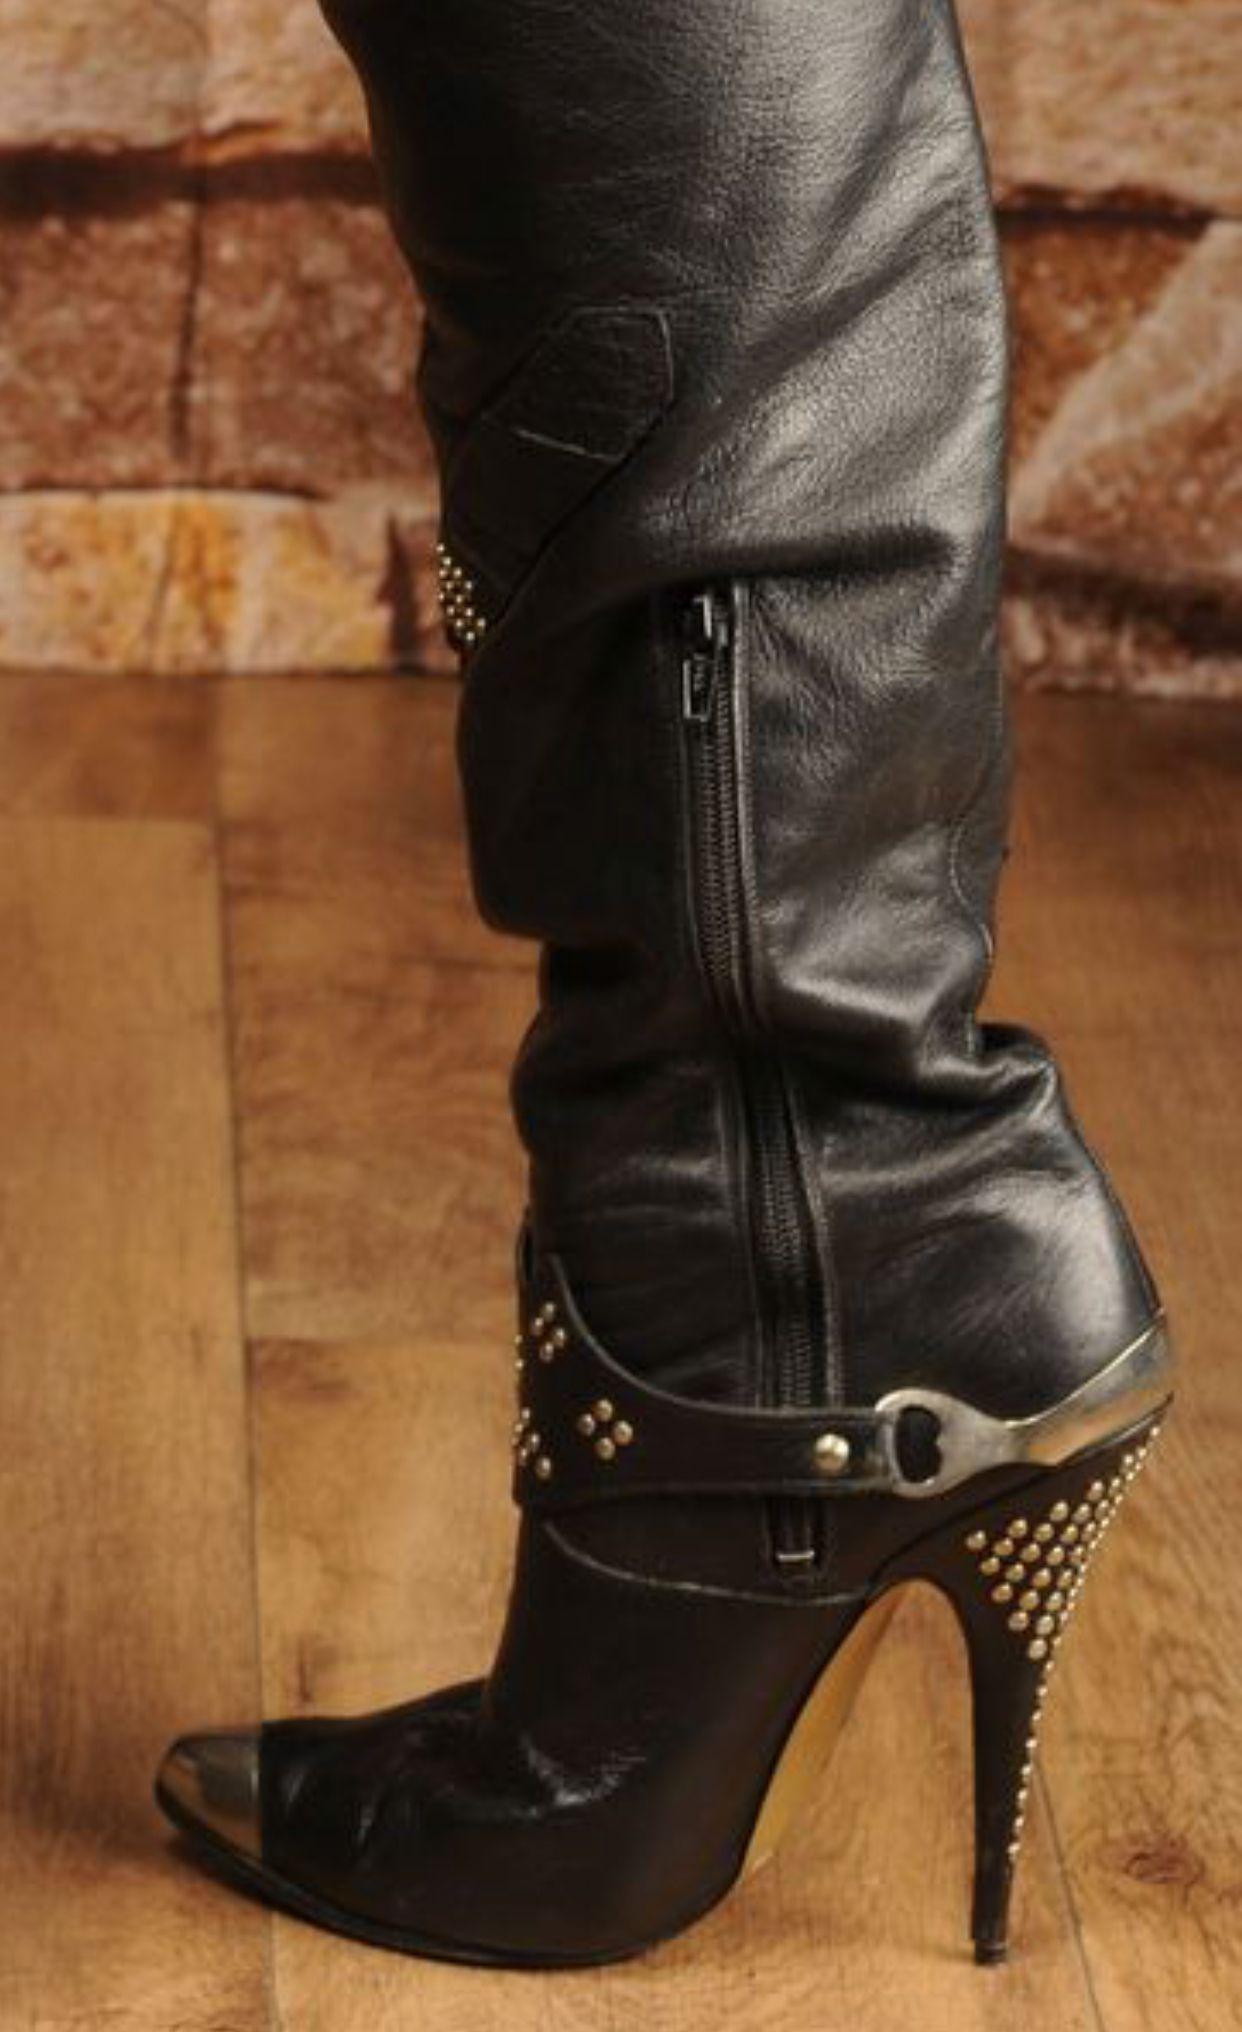 2292d5077ed35 80s style boots, #SavannahJames #rock #Retro80s | Mistress | Thigh ...